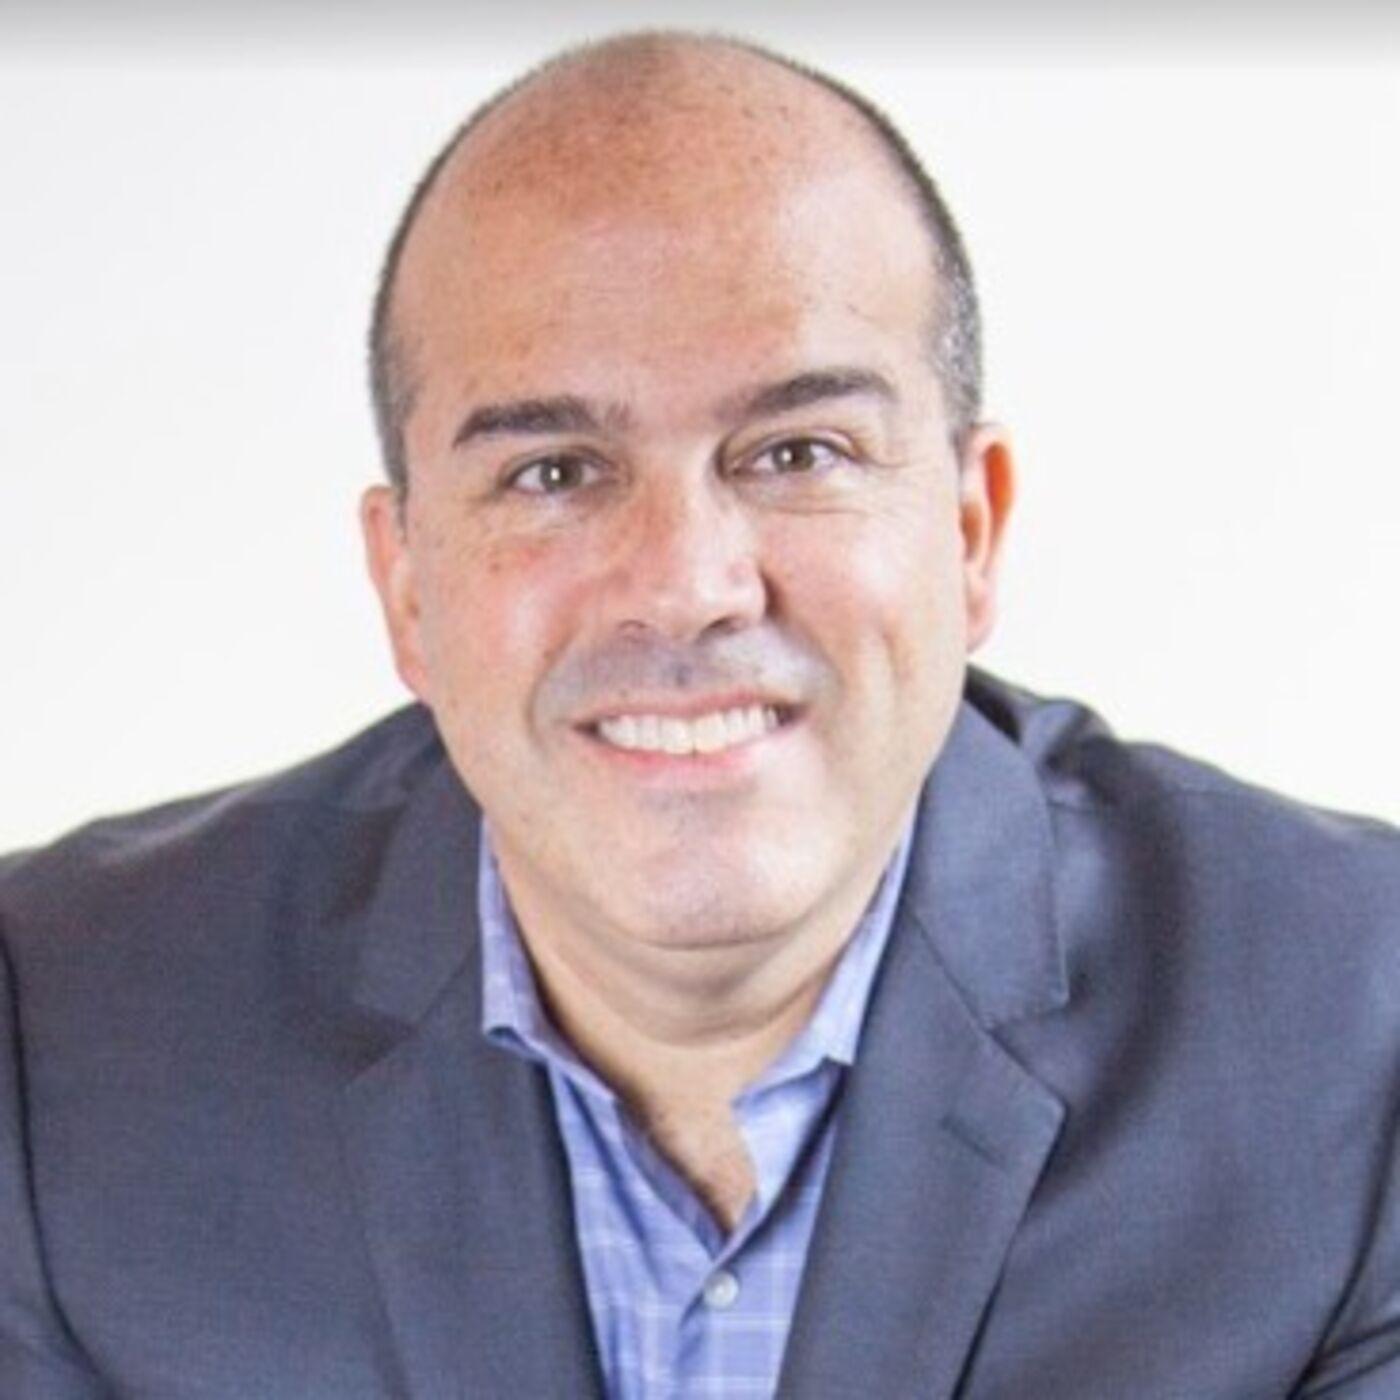 #10: Michel Montenegro, Principal Marketing Communications ENT at Medtronic